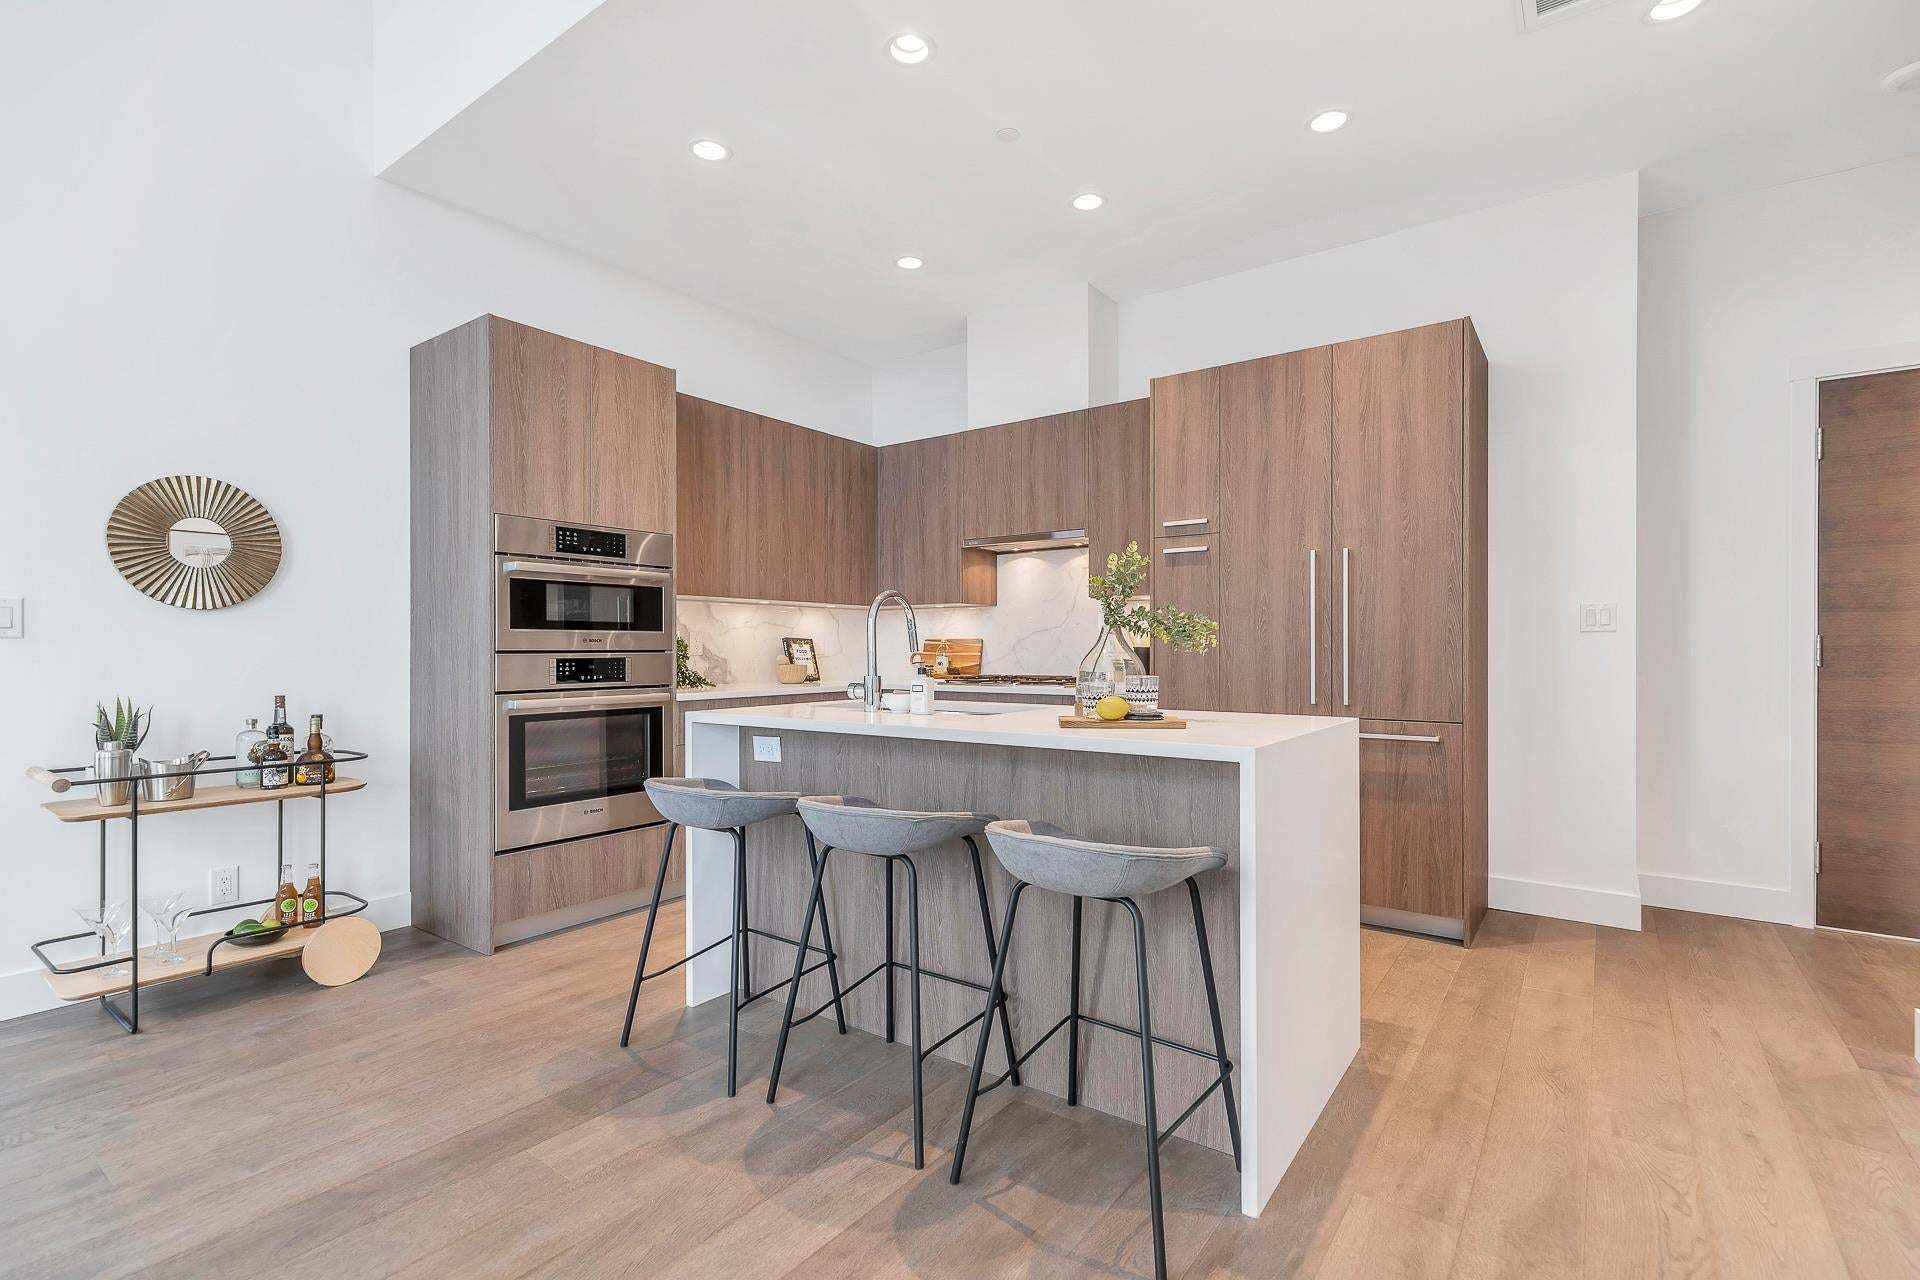 702 2780 VALLEY CENTRE AVENUE - Lynn Valley Apartment/Condo for sale, 3 Bedrooms (R2622279) - #7